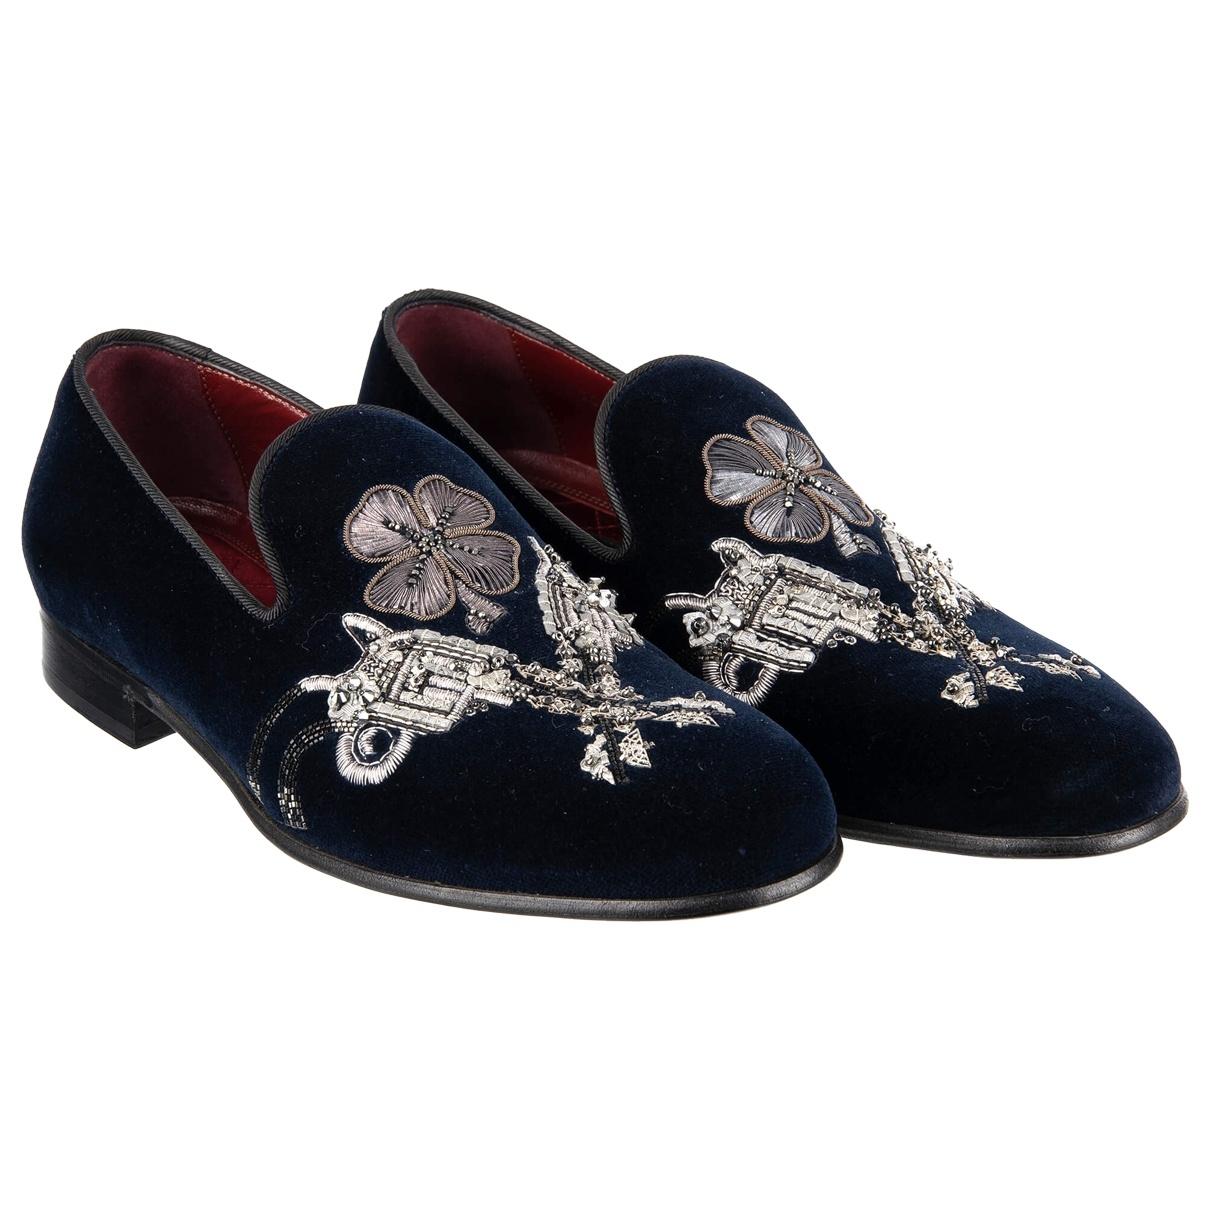 Mocasines de Terciopelo Dolce & Gabbana